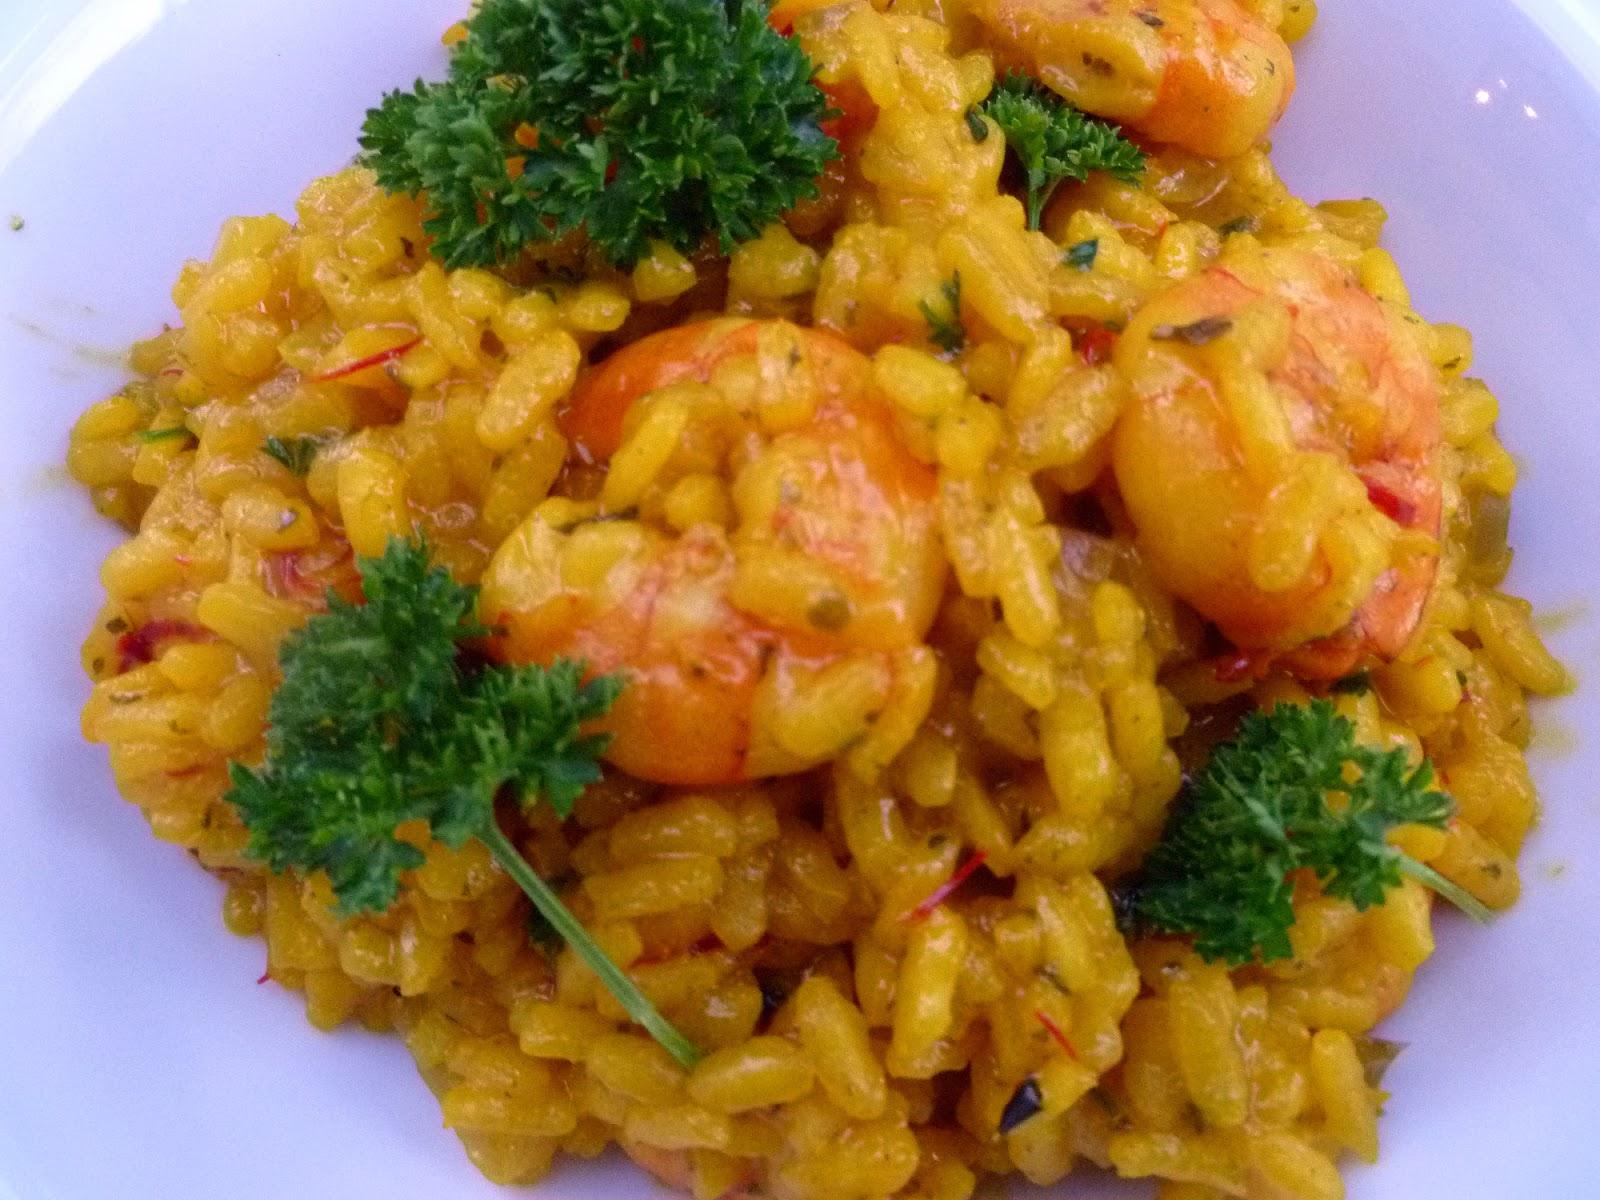 Shrimp Risotto With Saffron and Peas